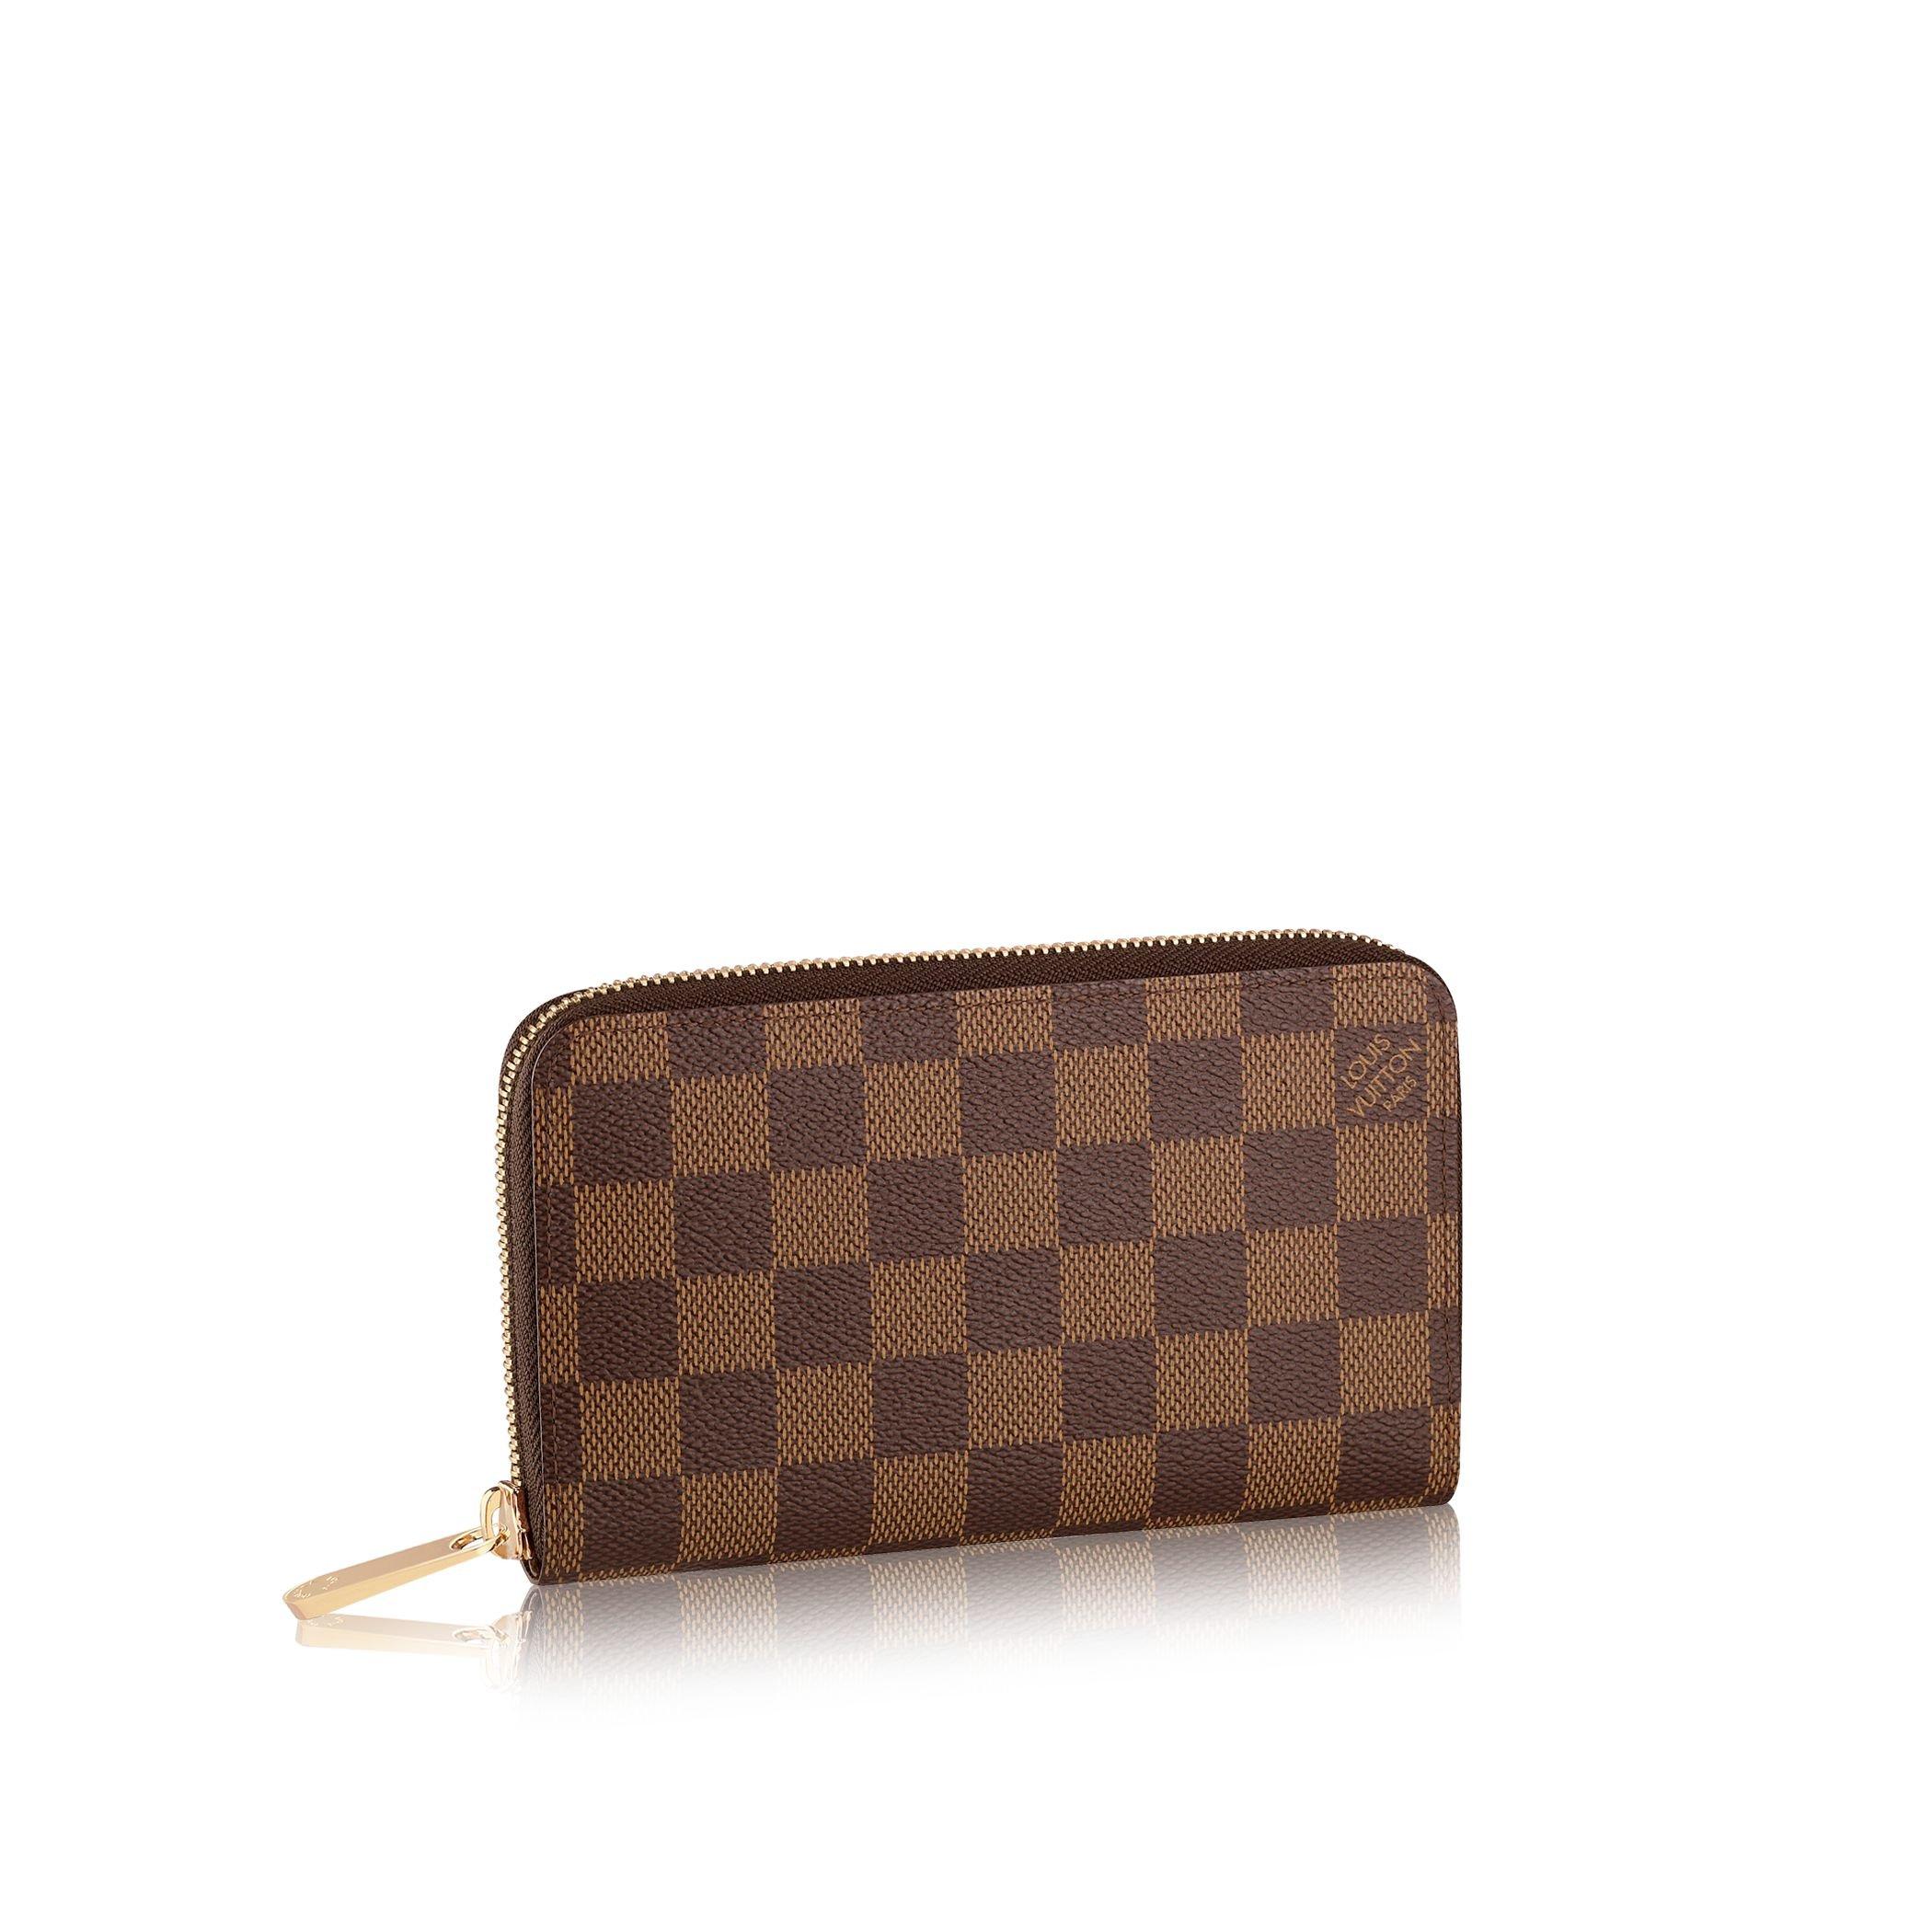 Louis Vuitton Zippy Compact Wallet In Brown Lyst